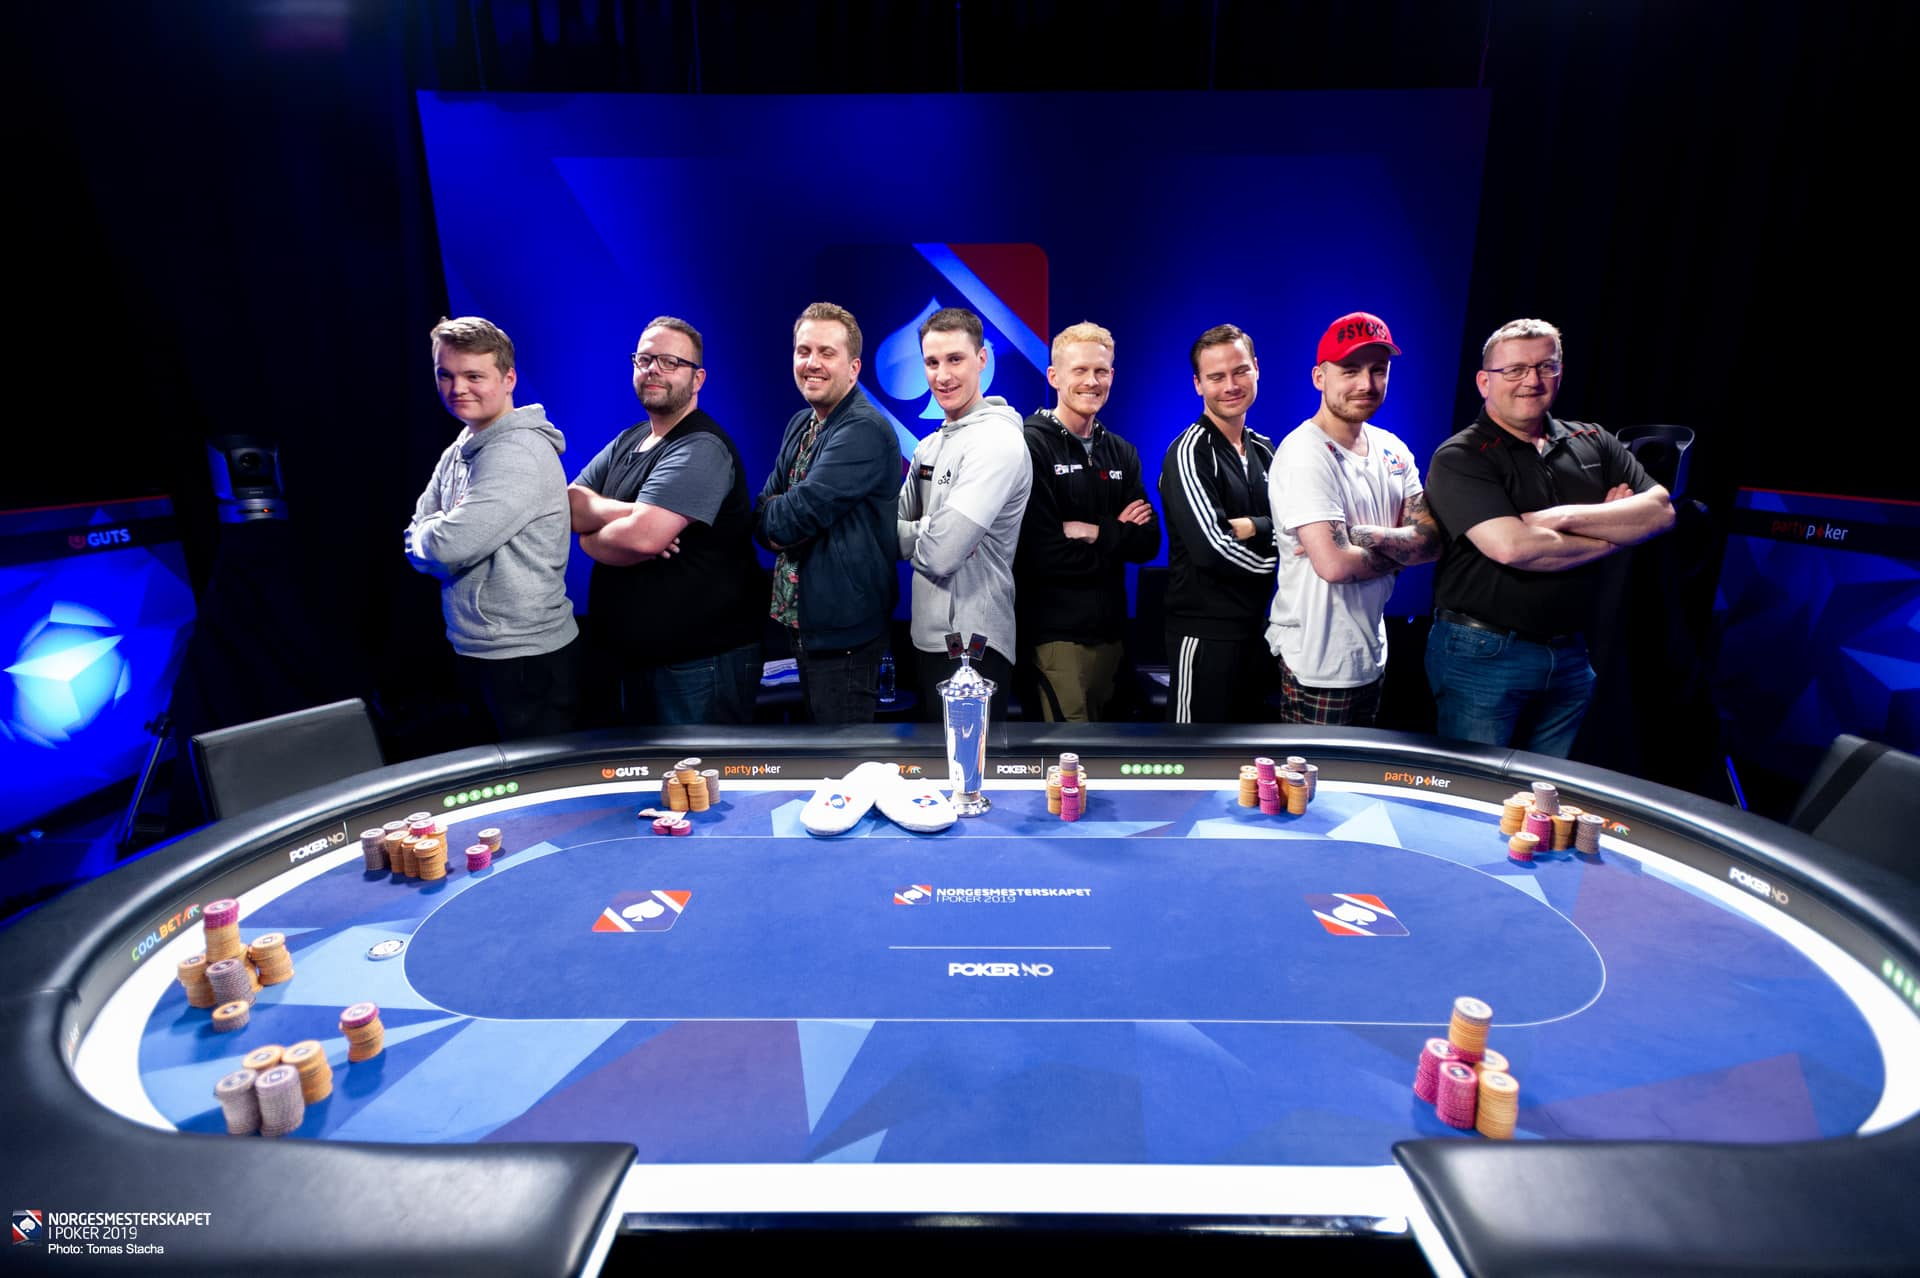 Poker Nm